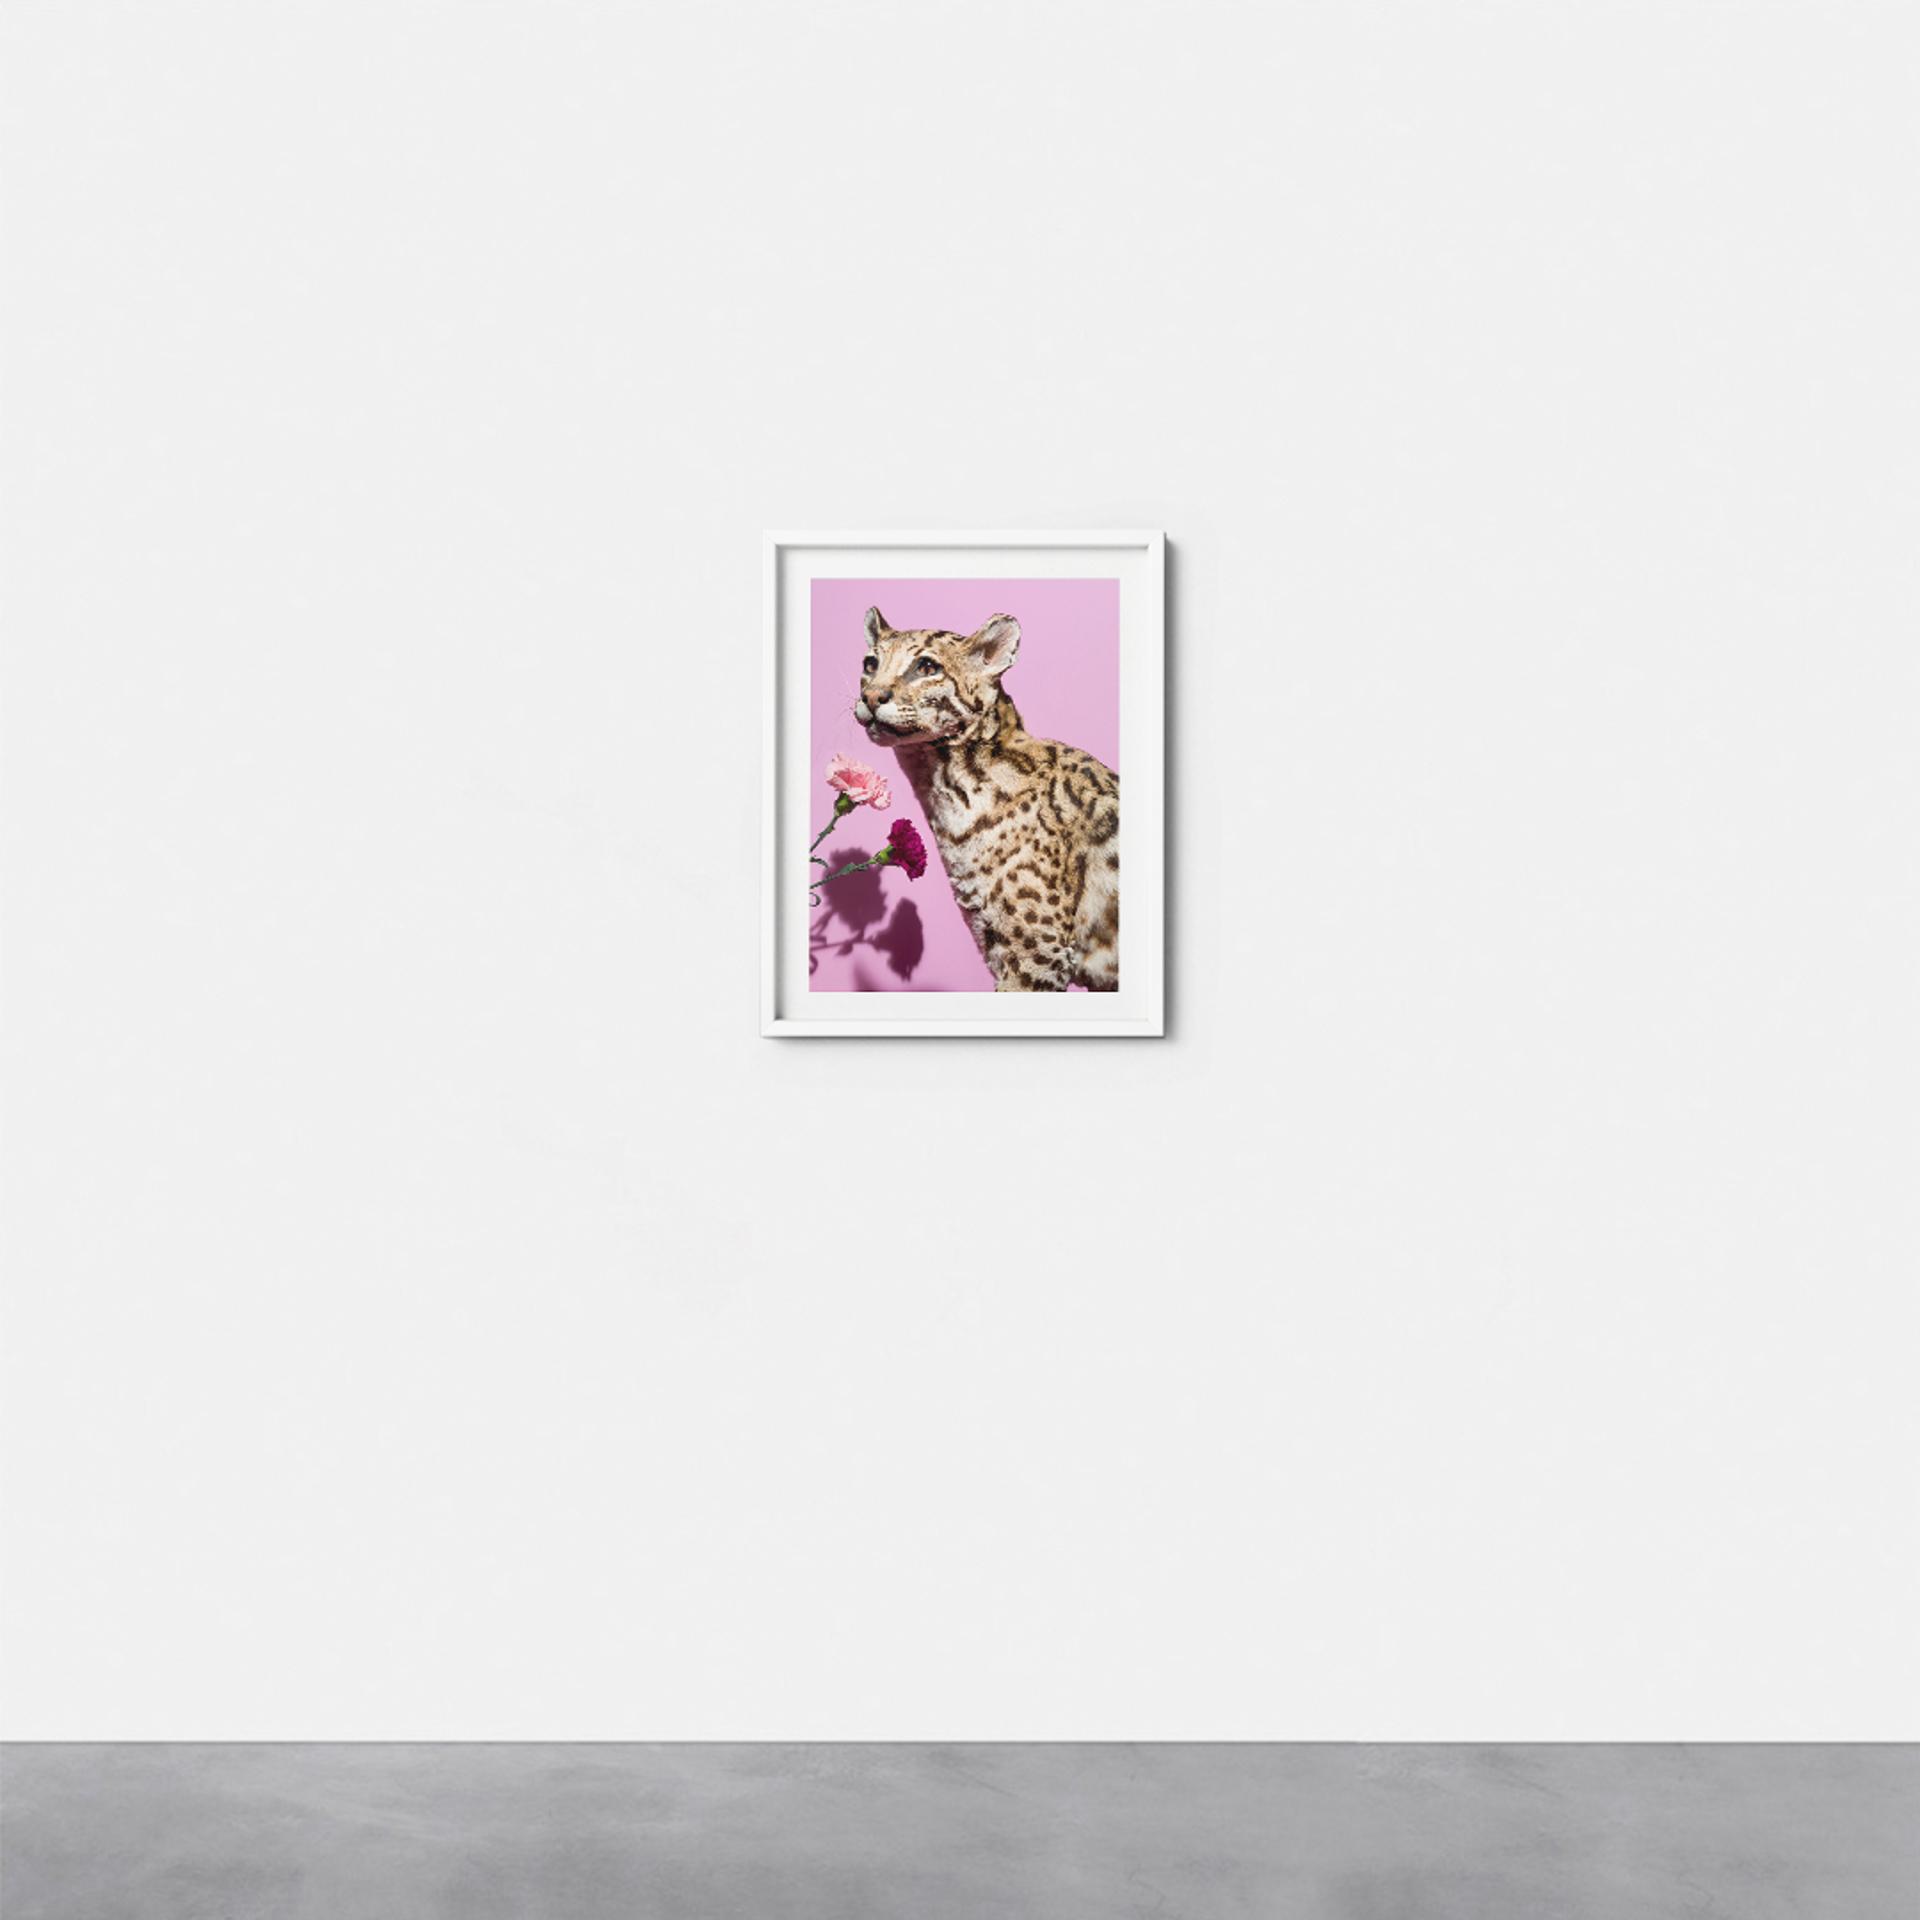 Extinct #4 by Gabriella Imperatori-Penn